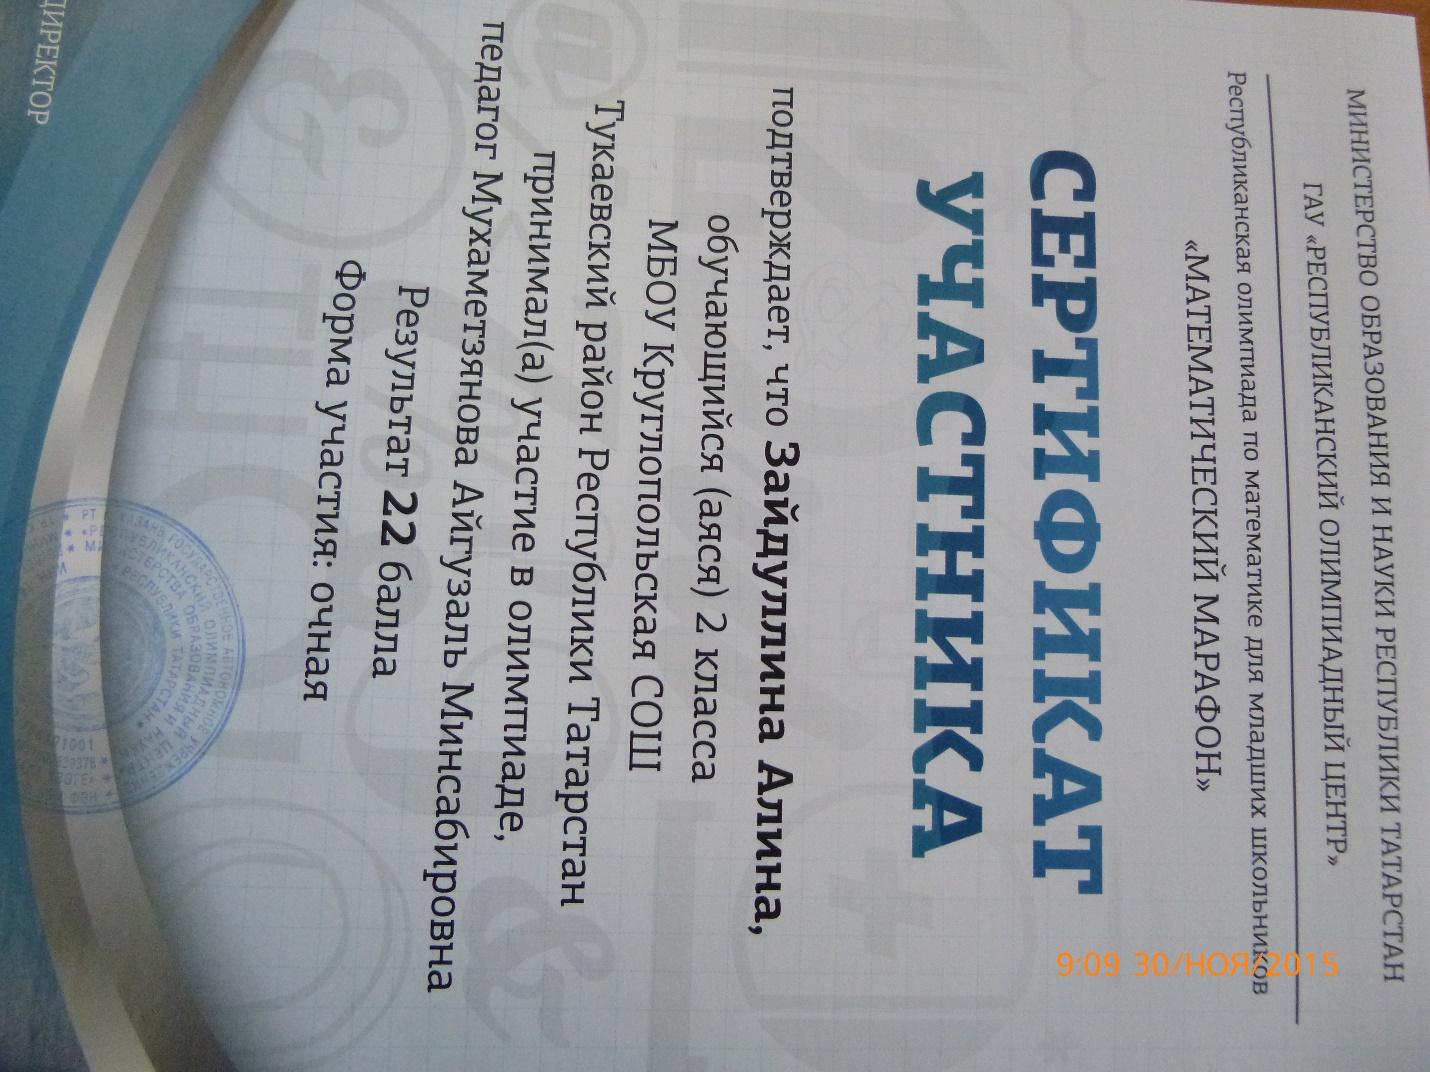 C:\Users\Айгузель\Desktop\грамоты\Сертификаты\P1060299.JPG